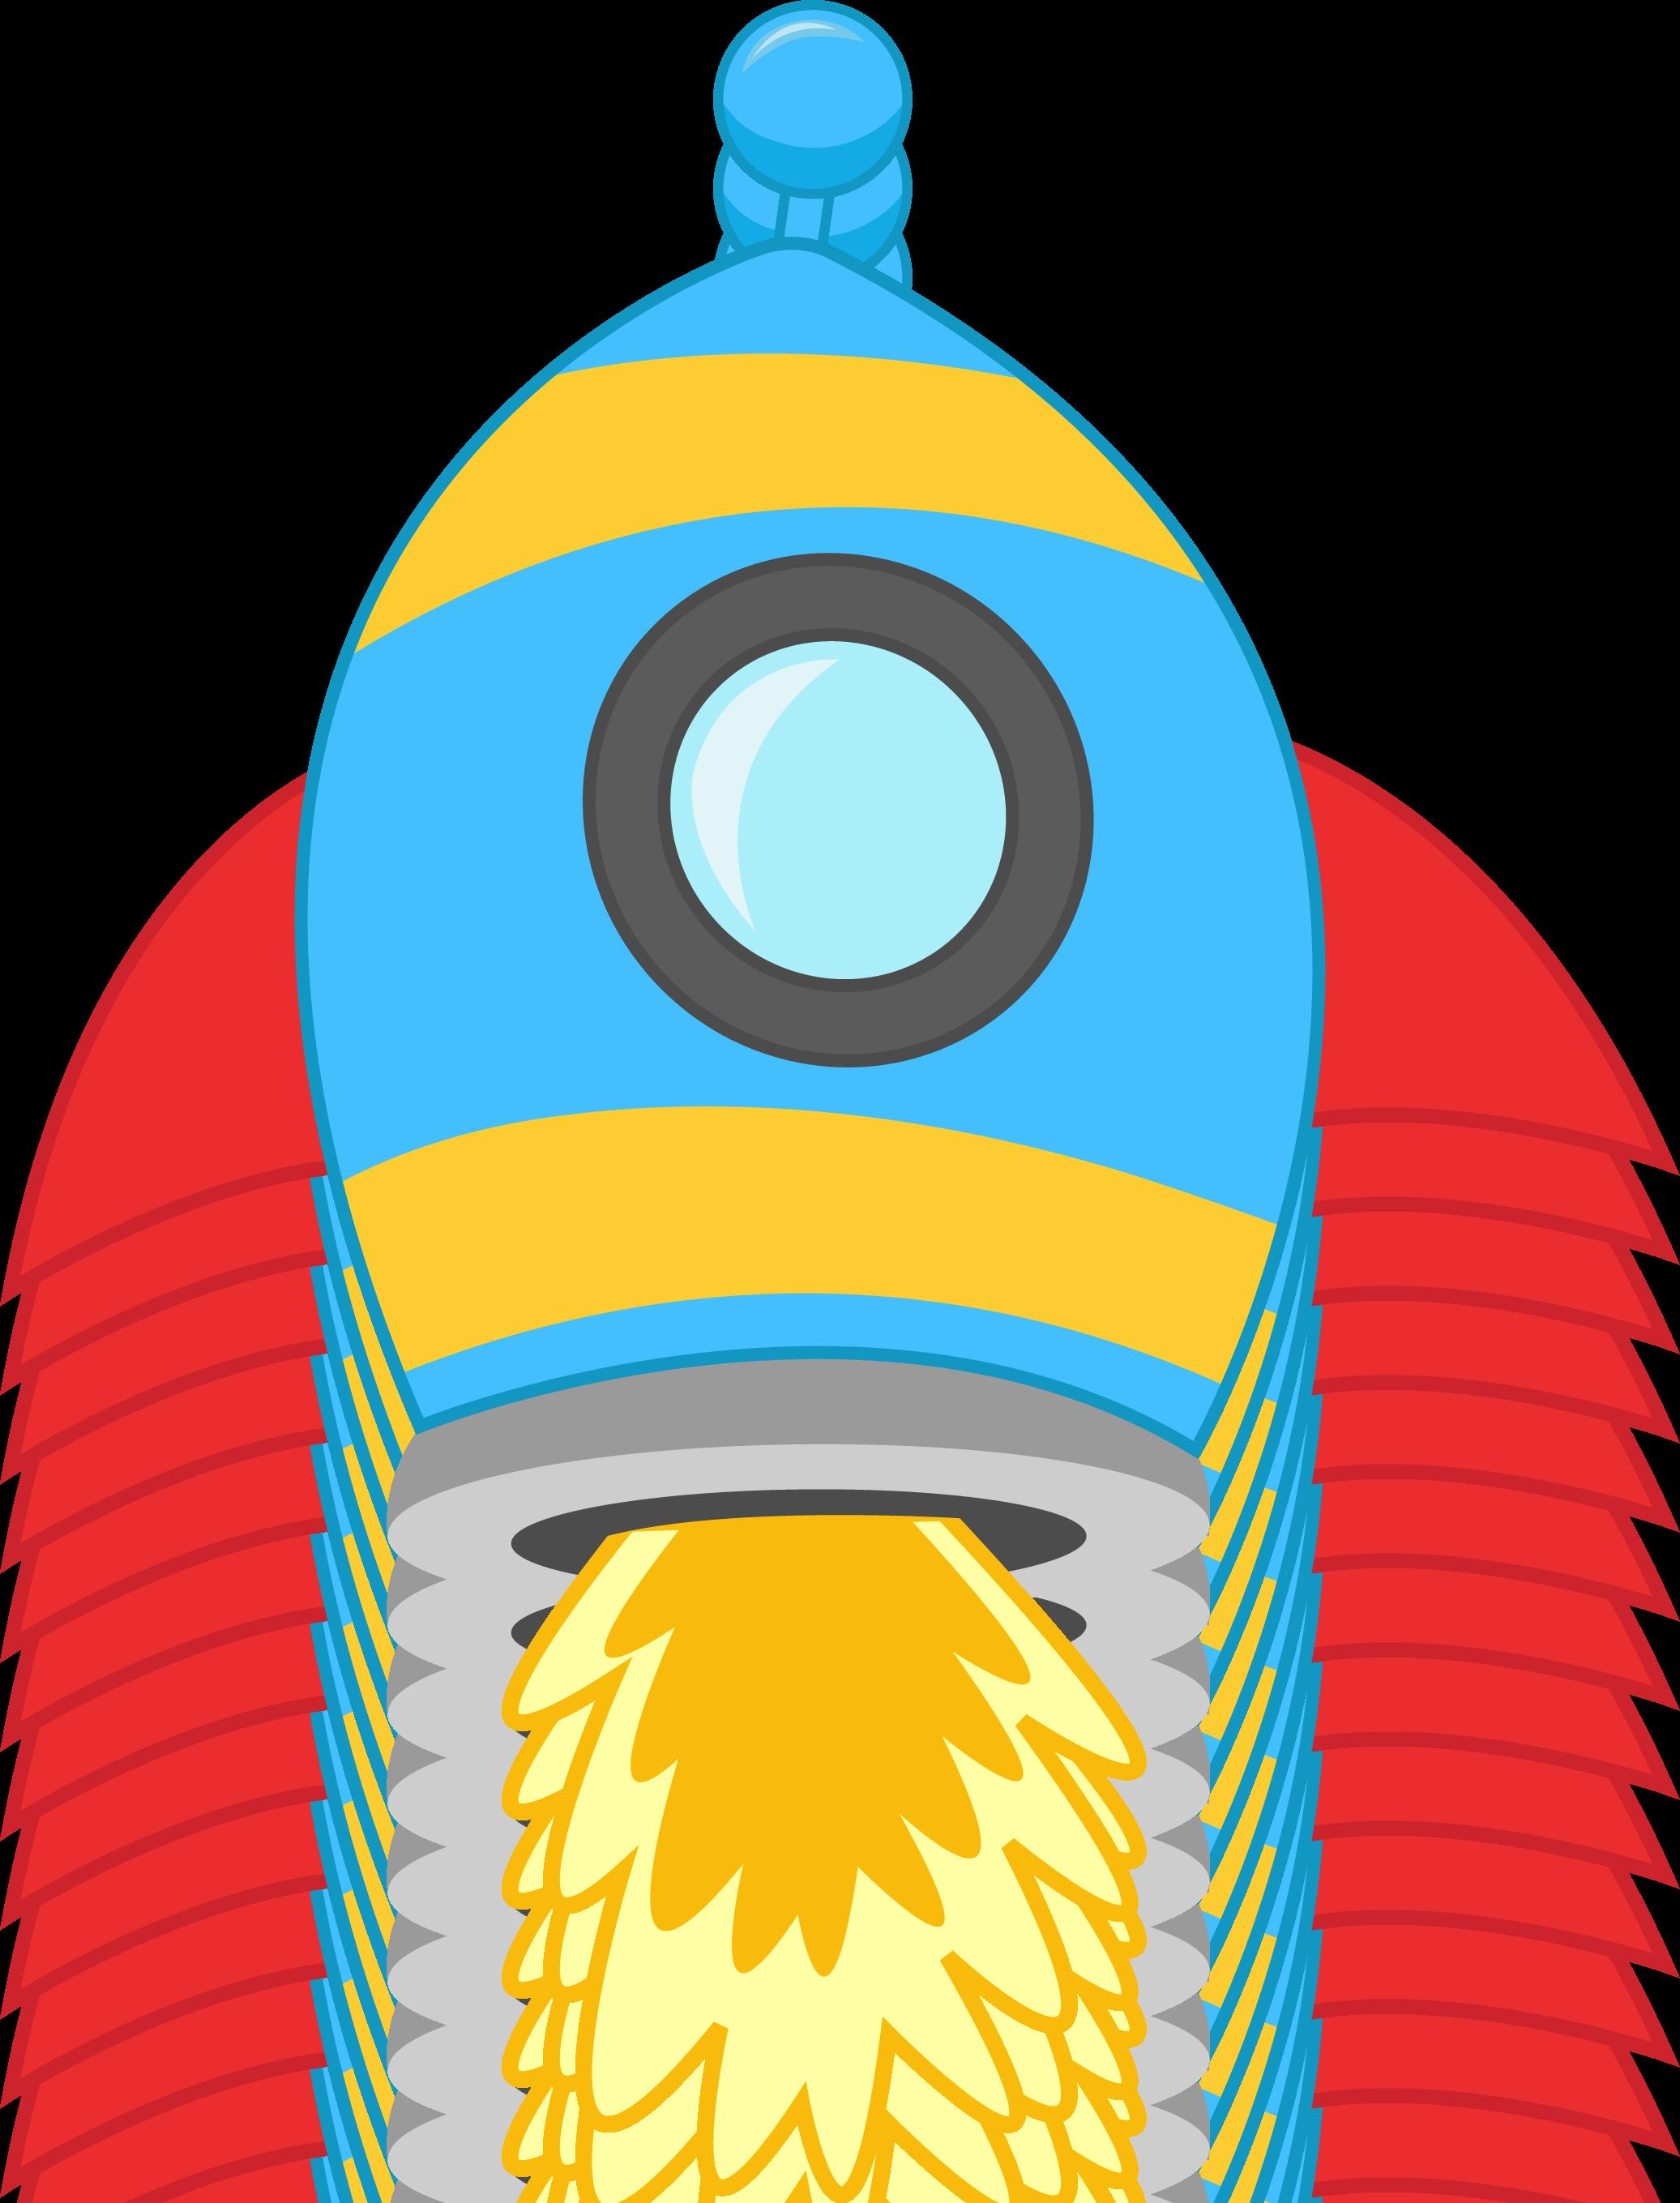 pinterest scrap and. Galaxy clipart rocket ship